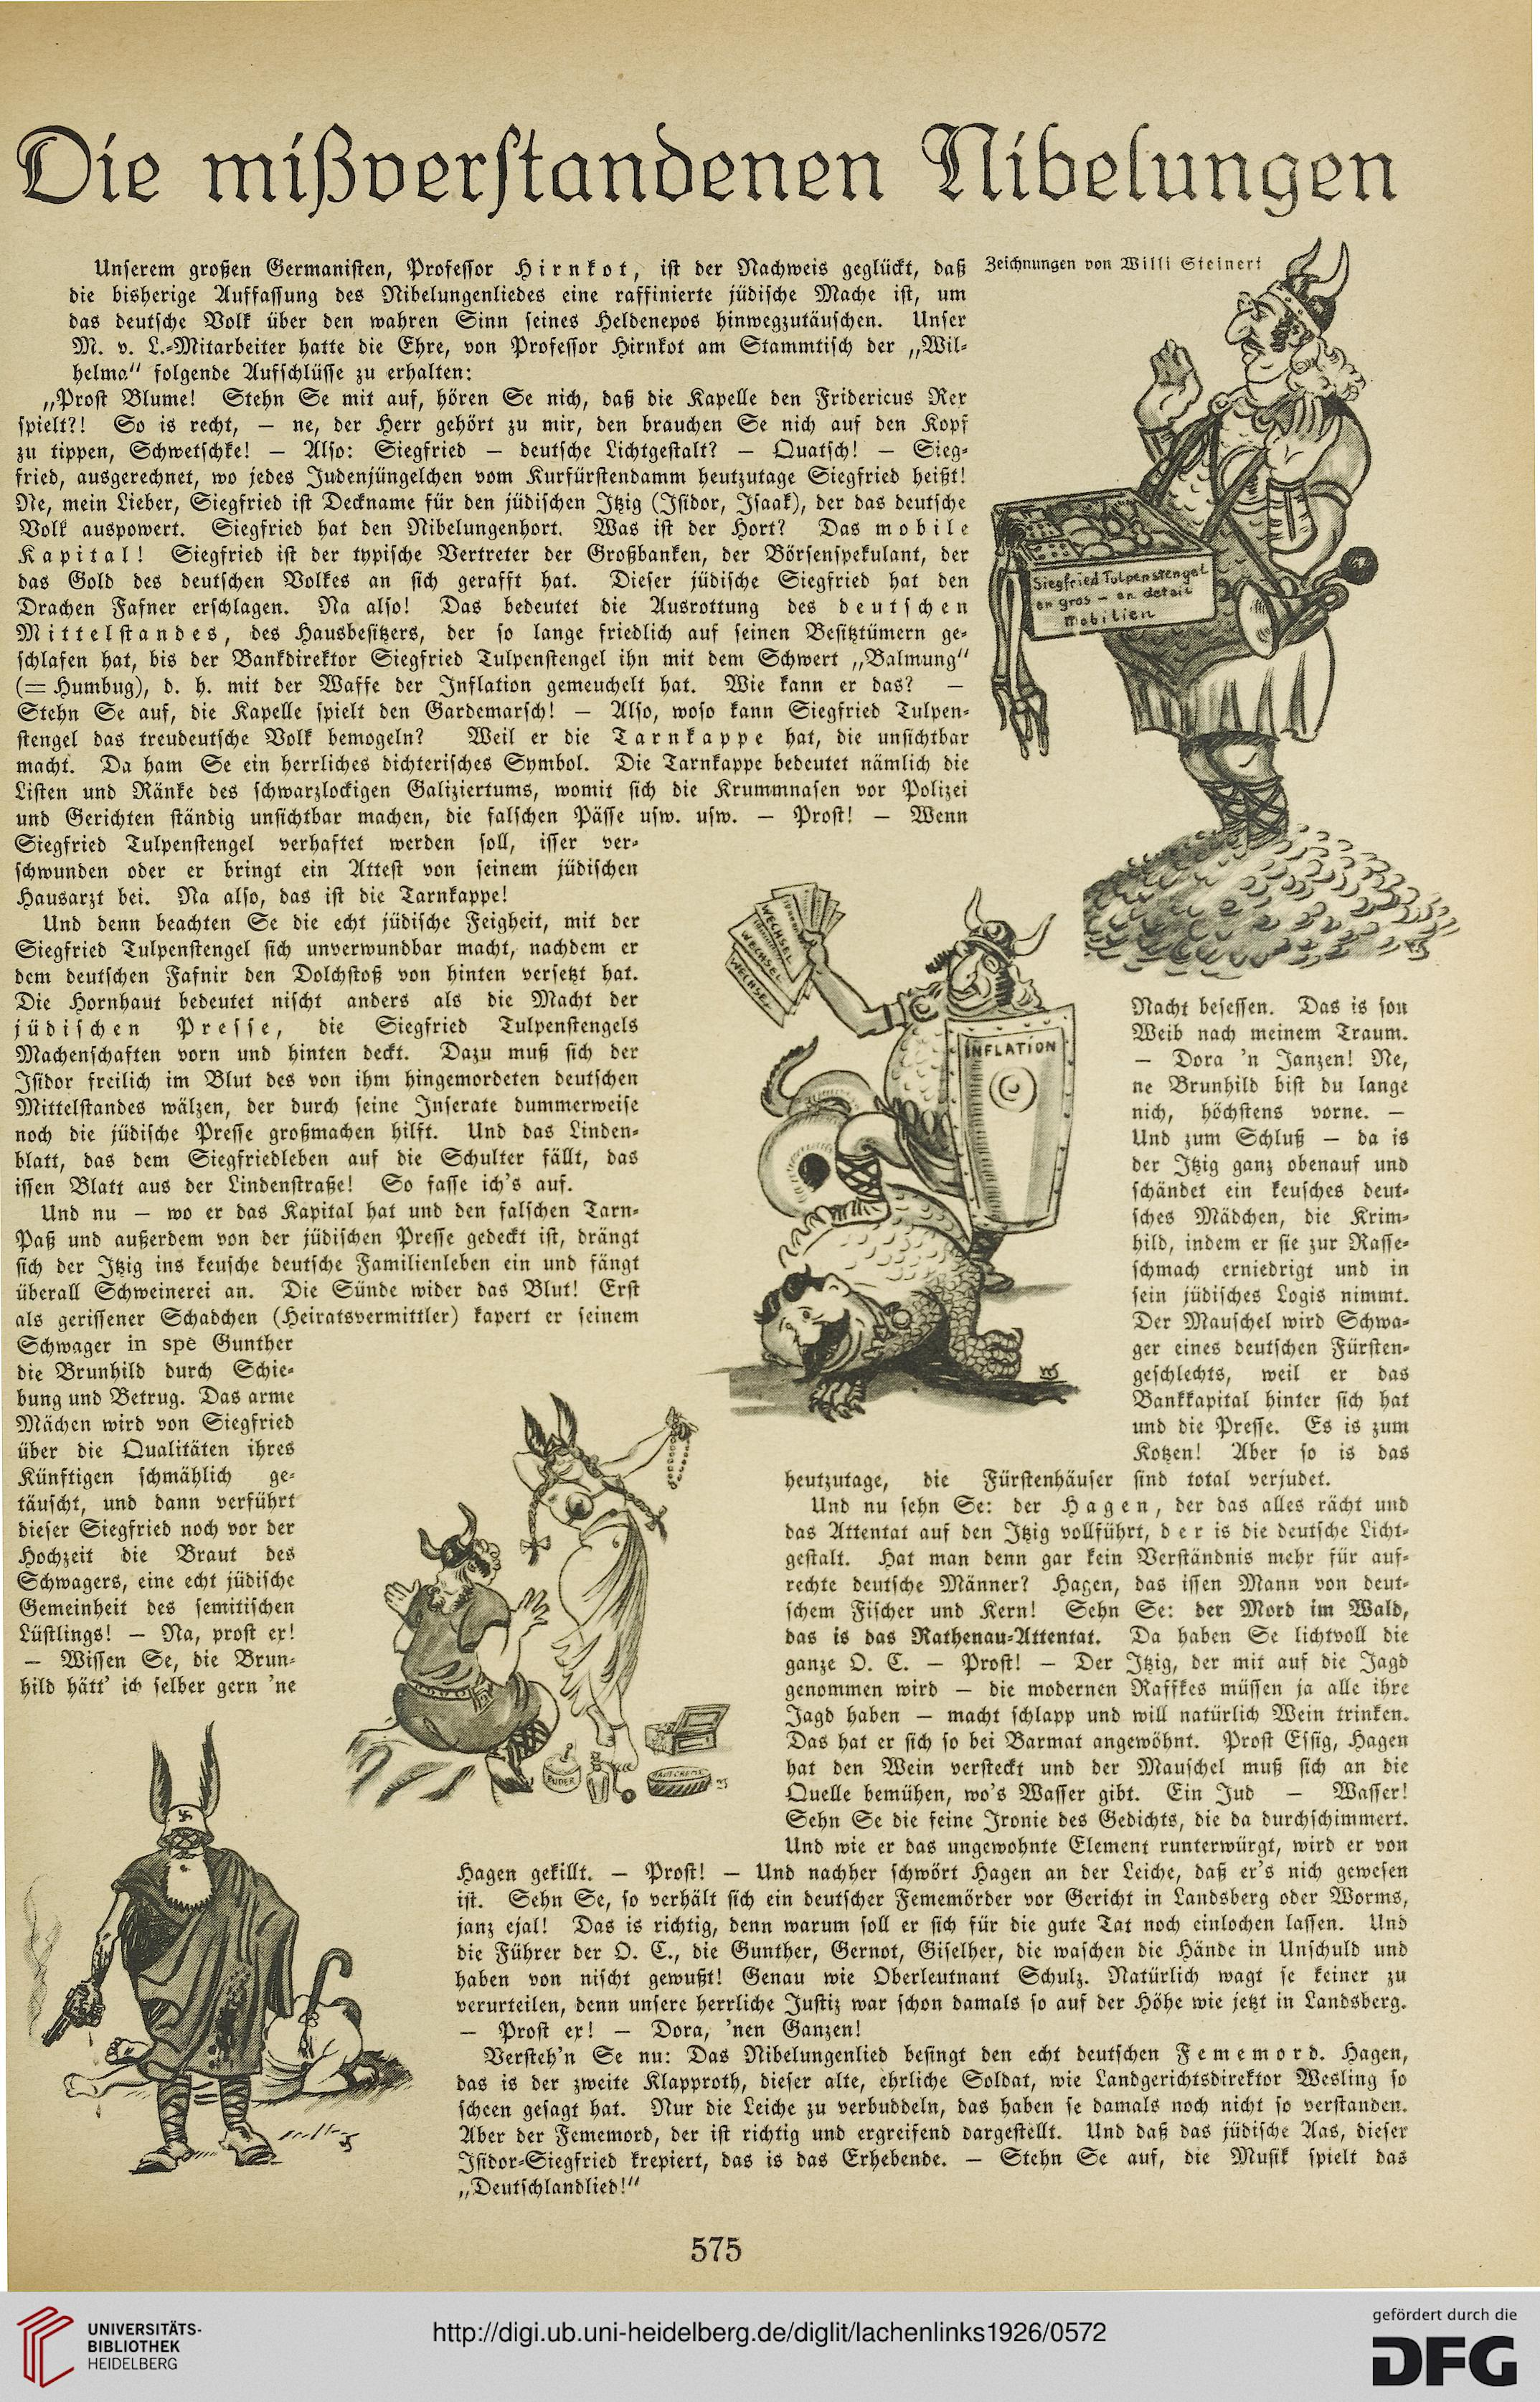 Lachen links: das republikanische Witzblatt (3.1926)